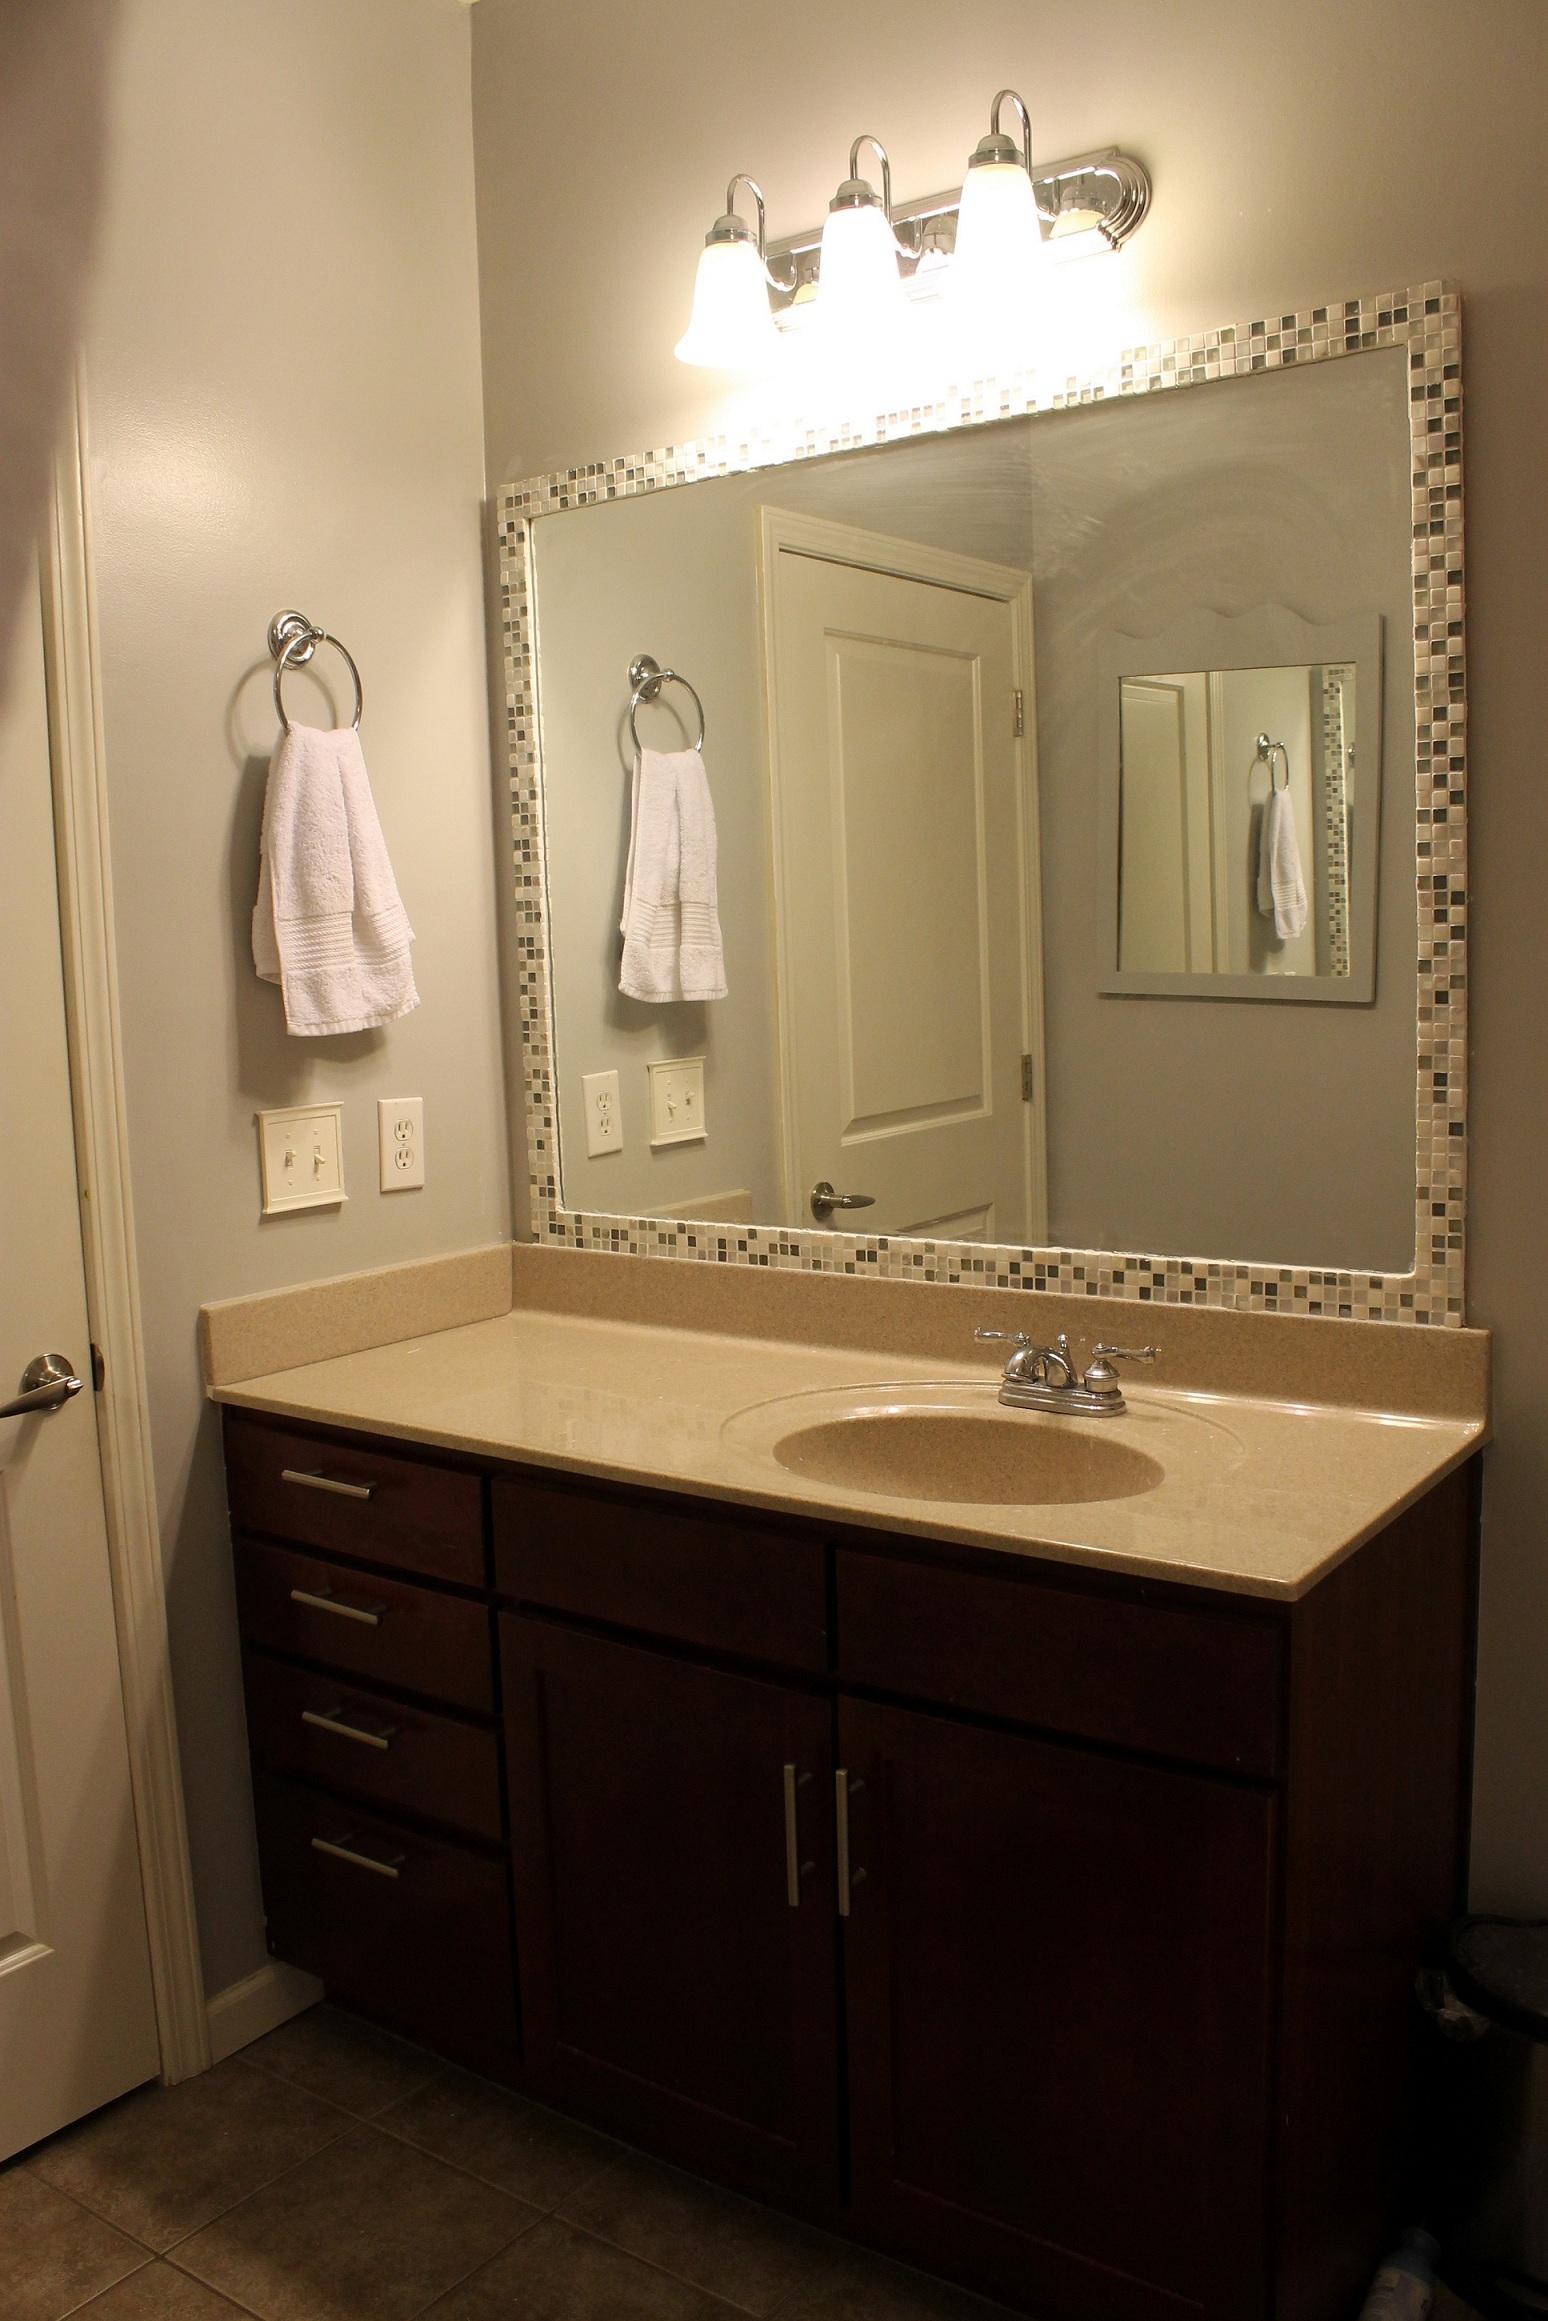 Stick Mirror To Bathroom Wall